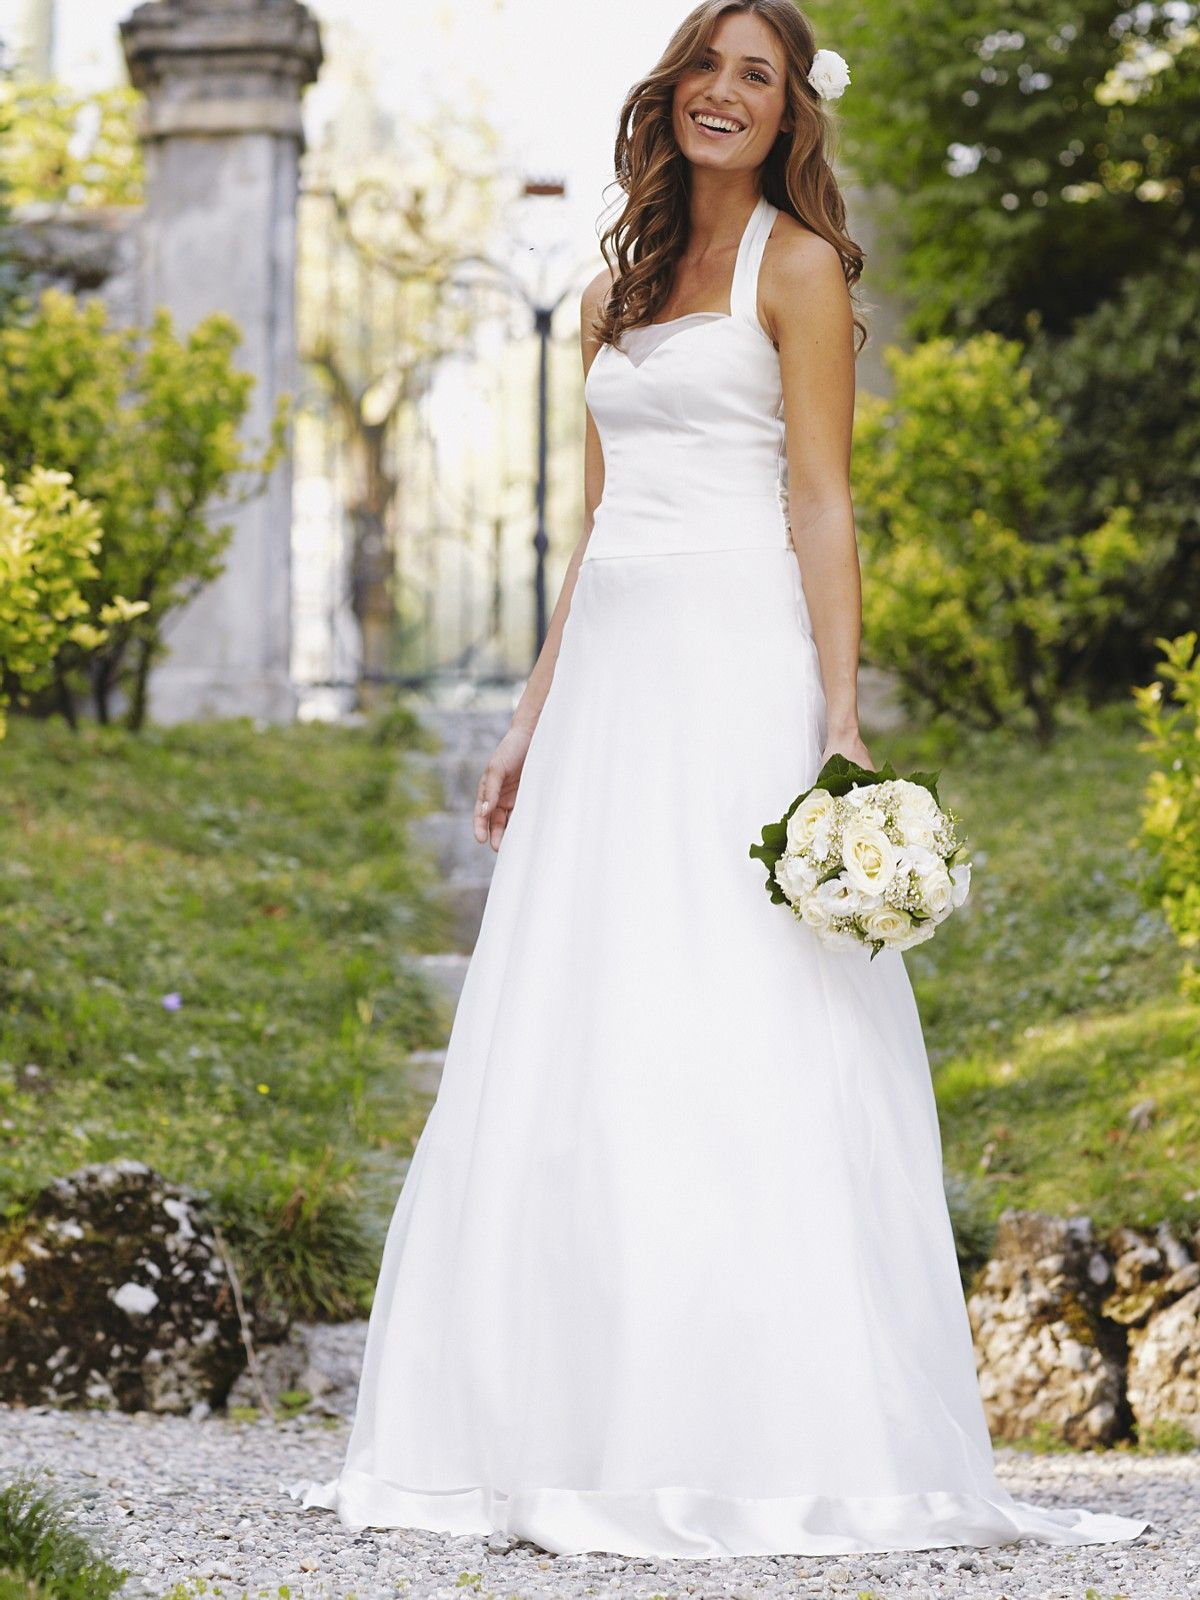 Halter style wedding dresses  cute dress Chelsea Pelzel  Wedding ideaus  Pinterest  Halter